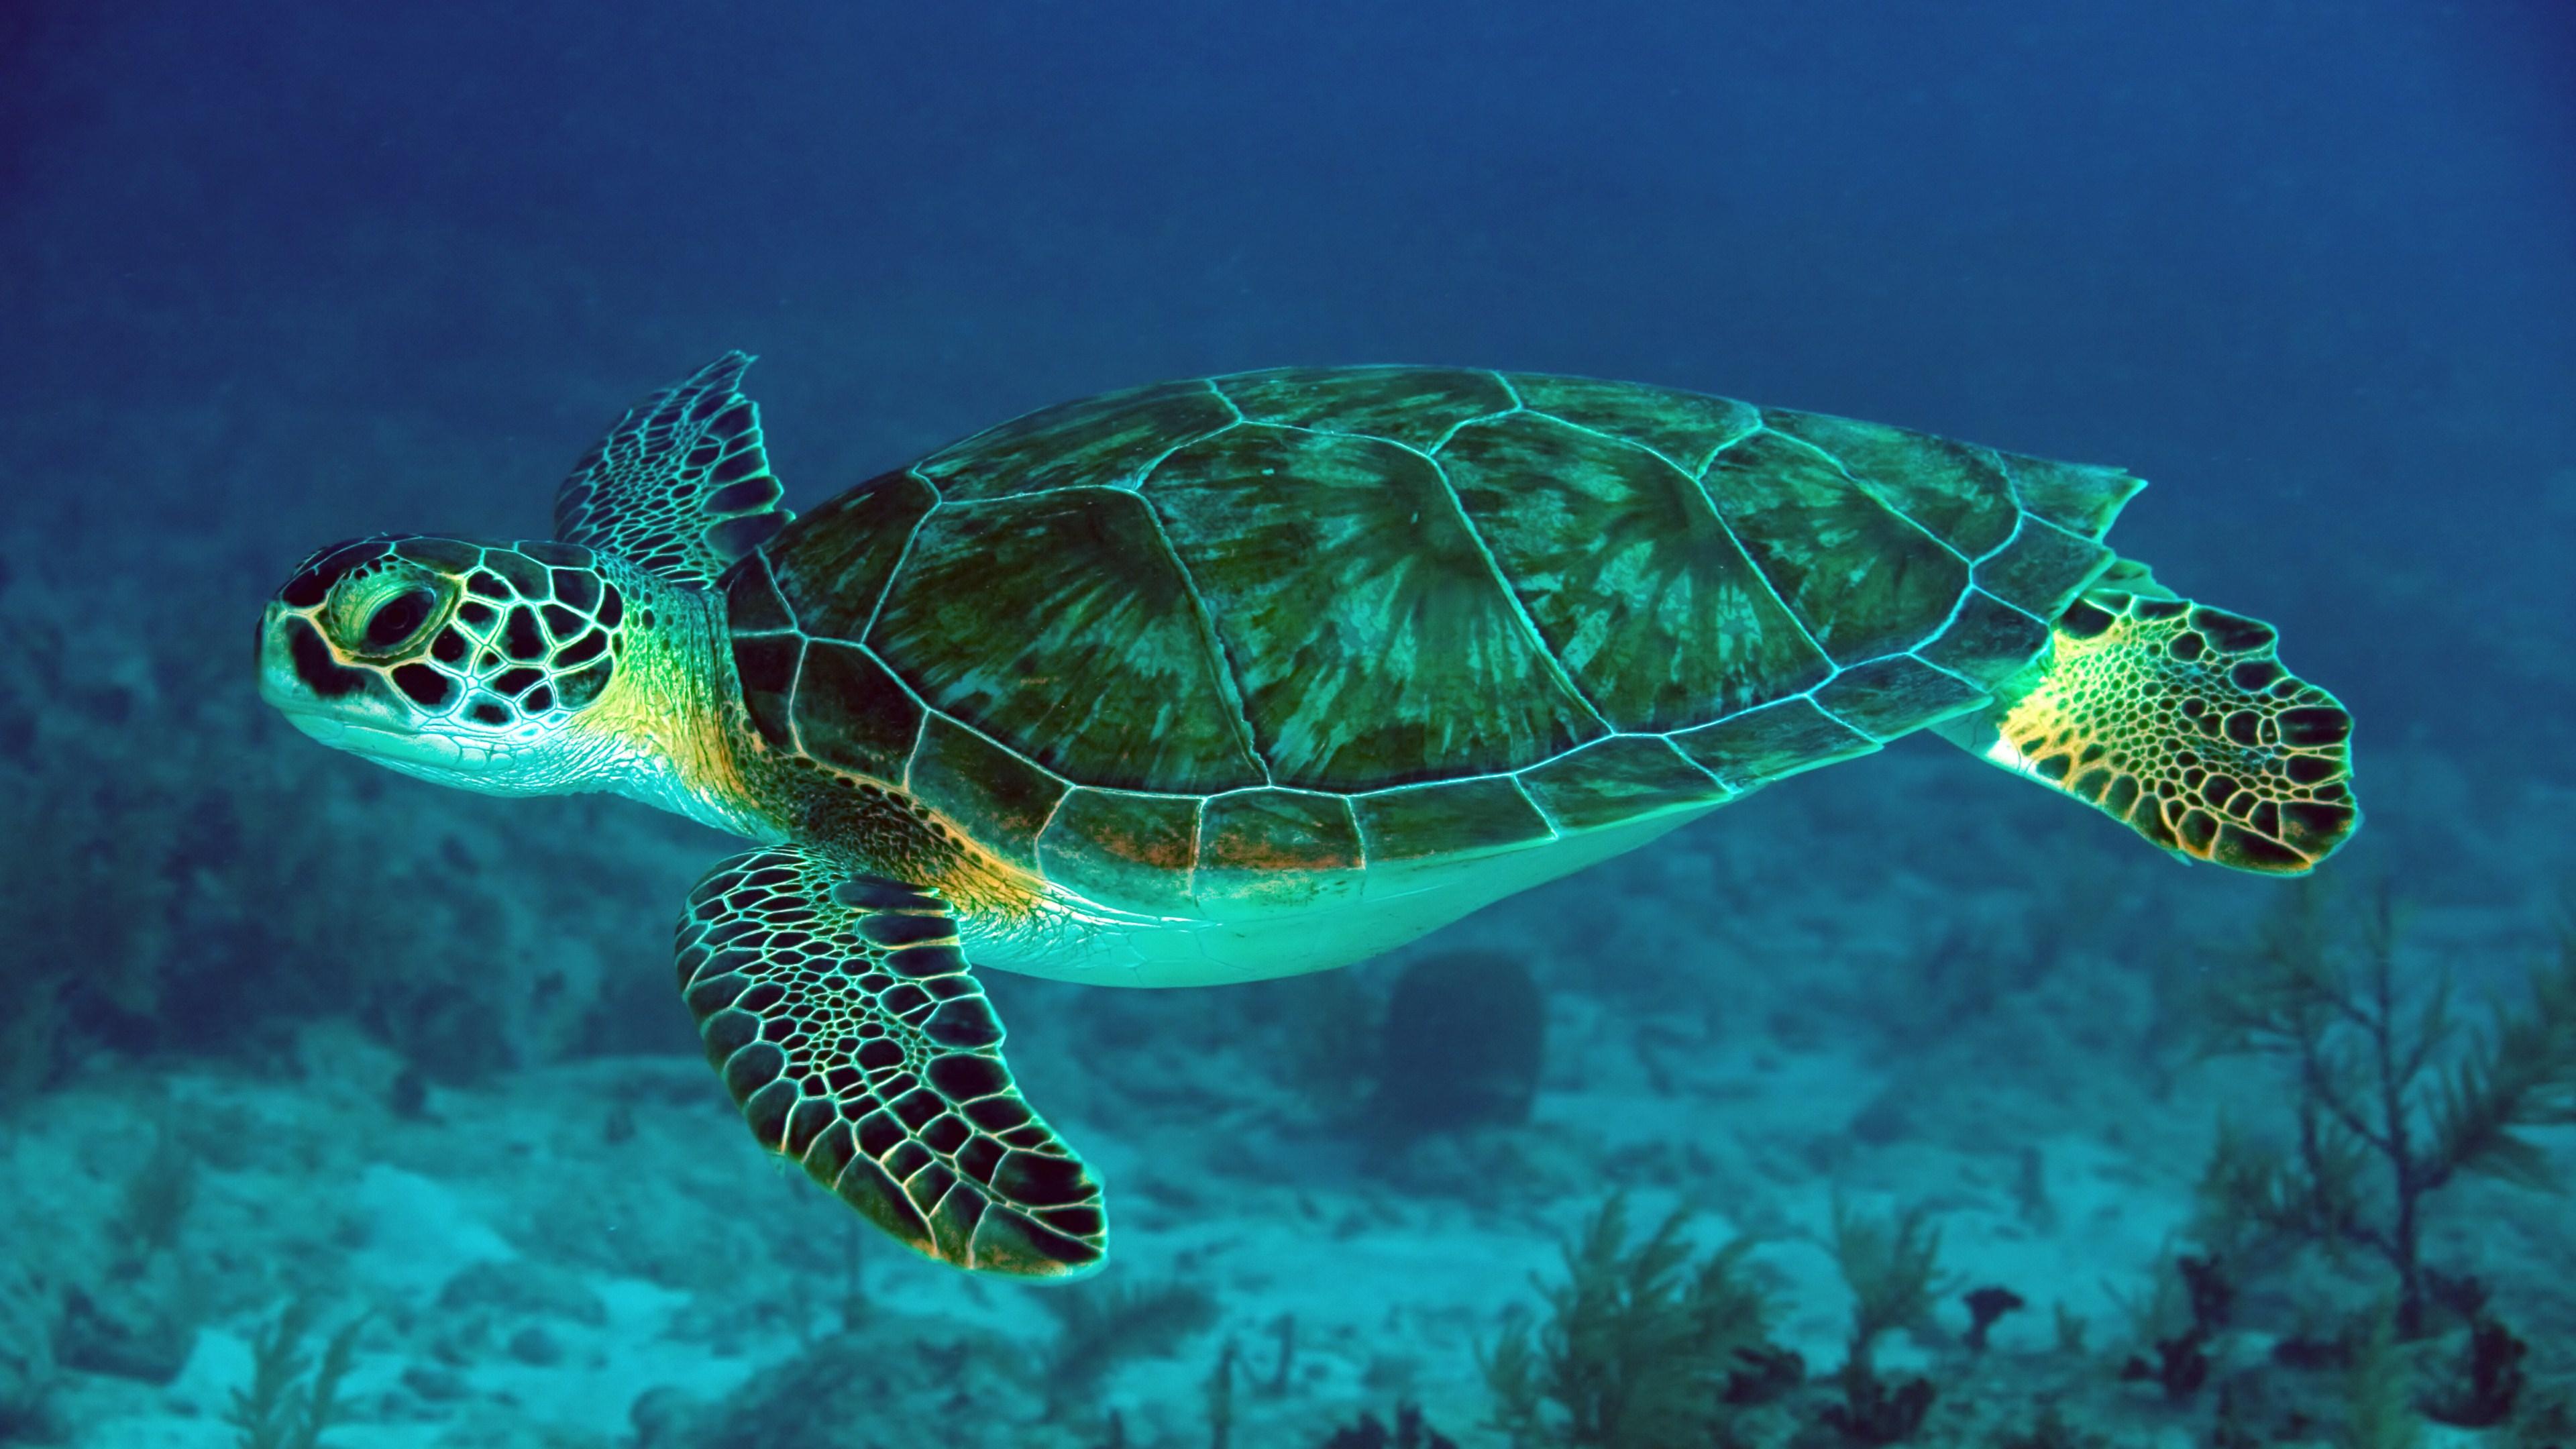 48 Sea Turtle Wallpaper Desktop On Wallpapersafari